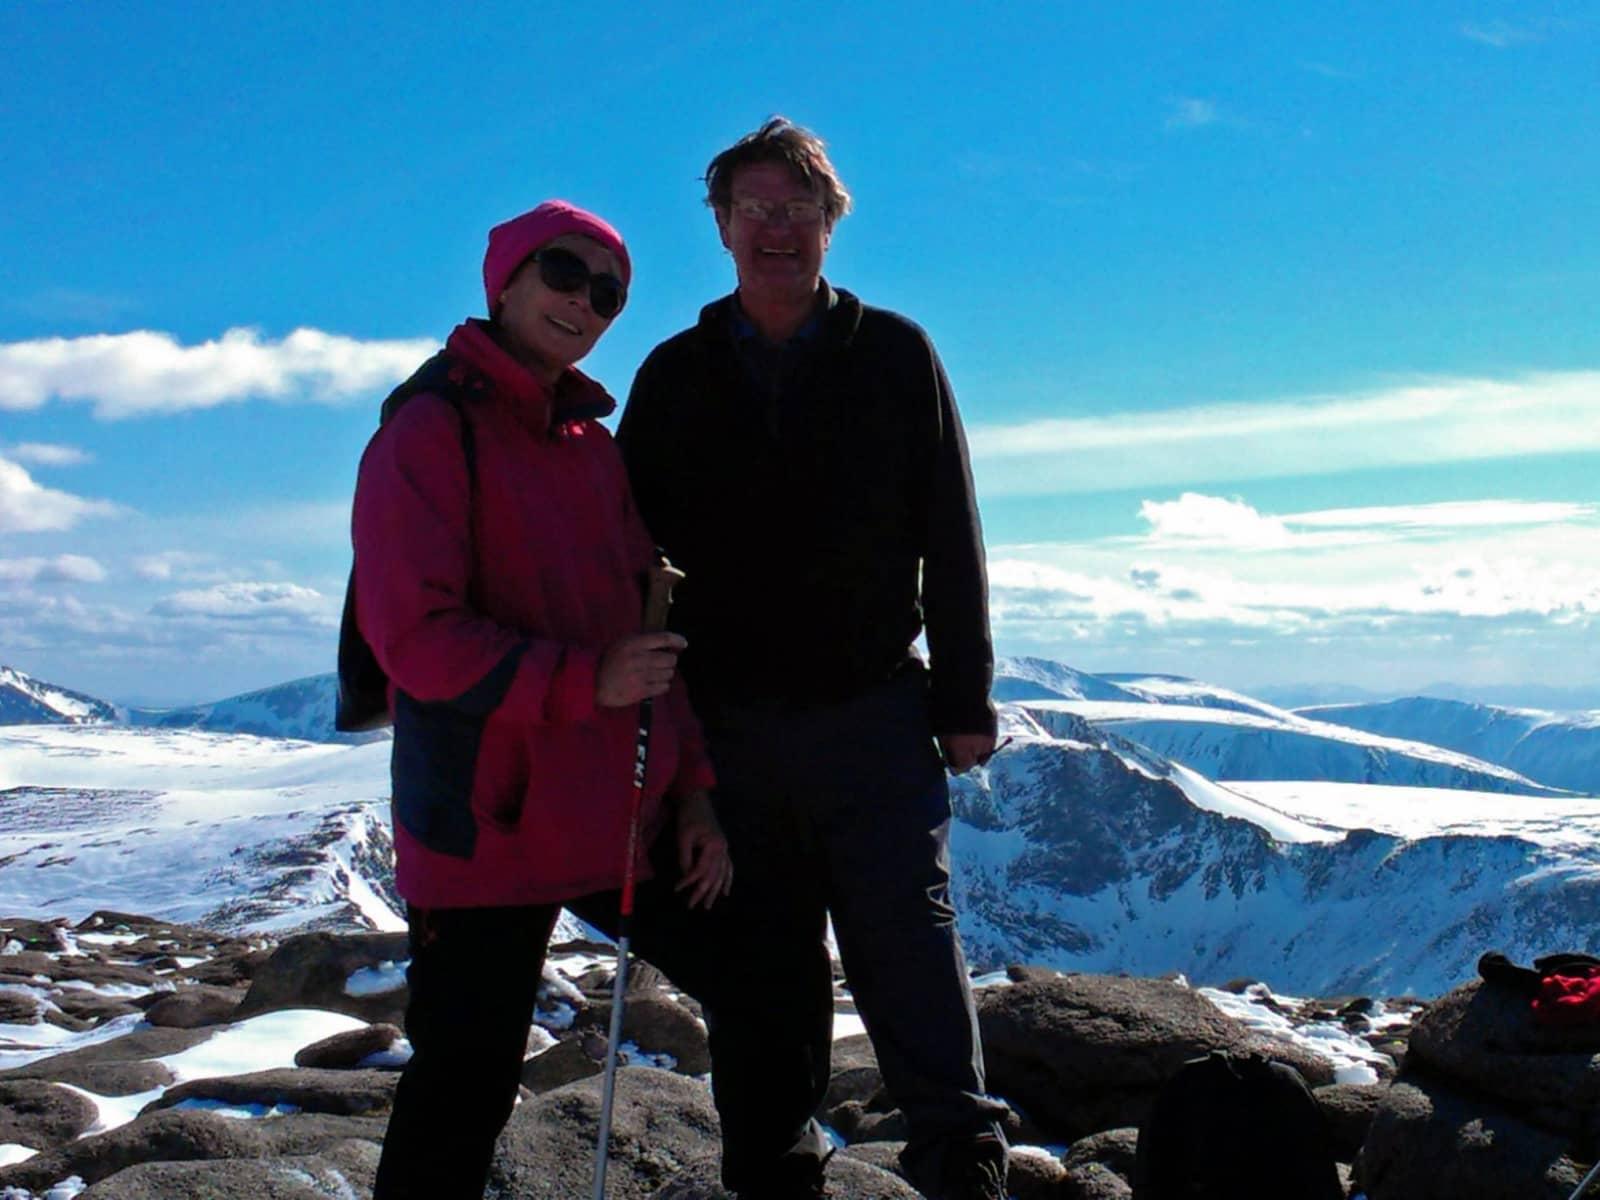 Neil & Sarah from Great Malvern, United Kingdom